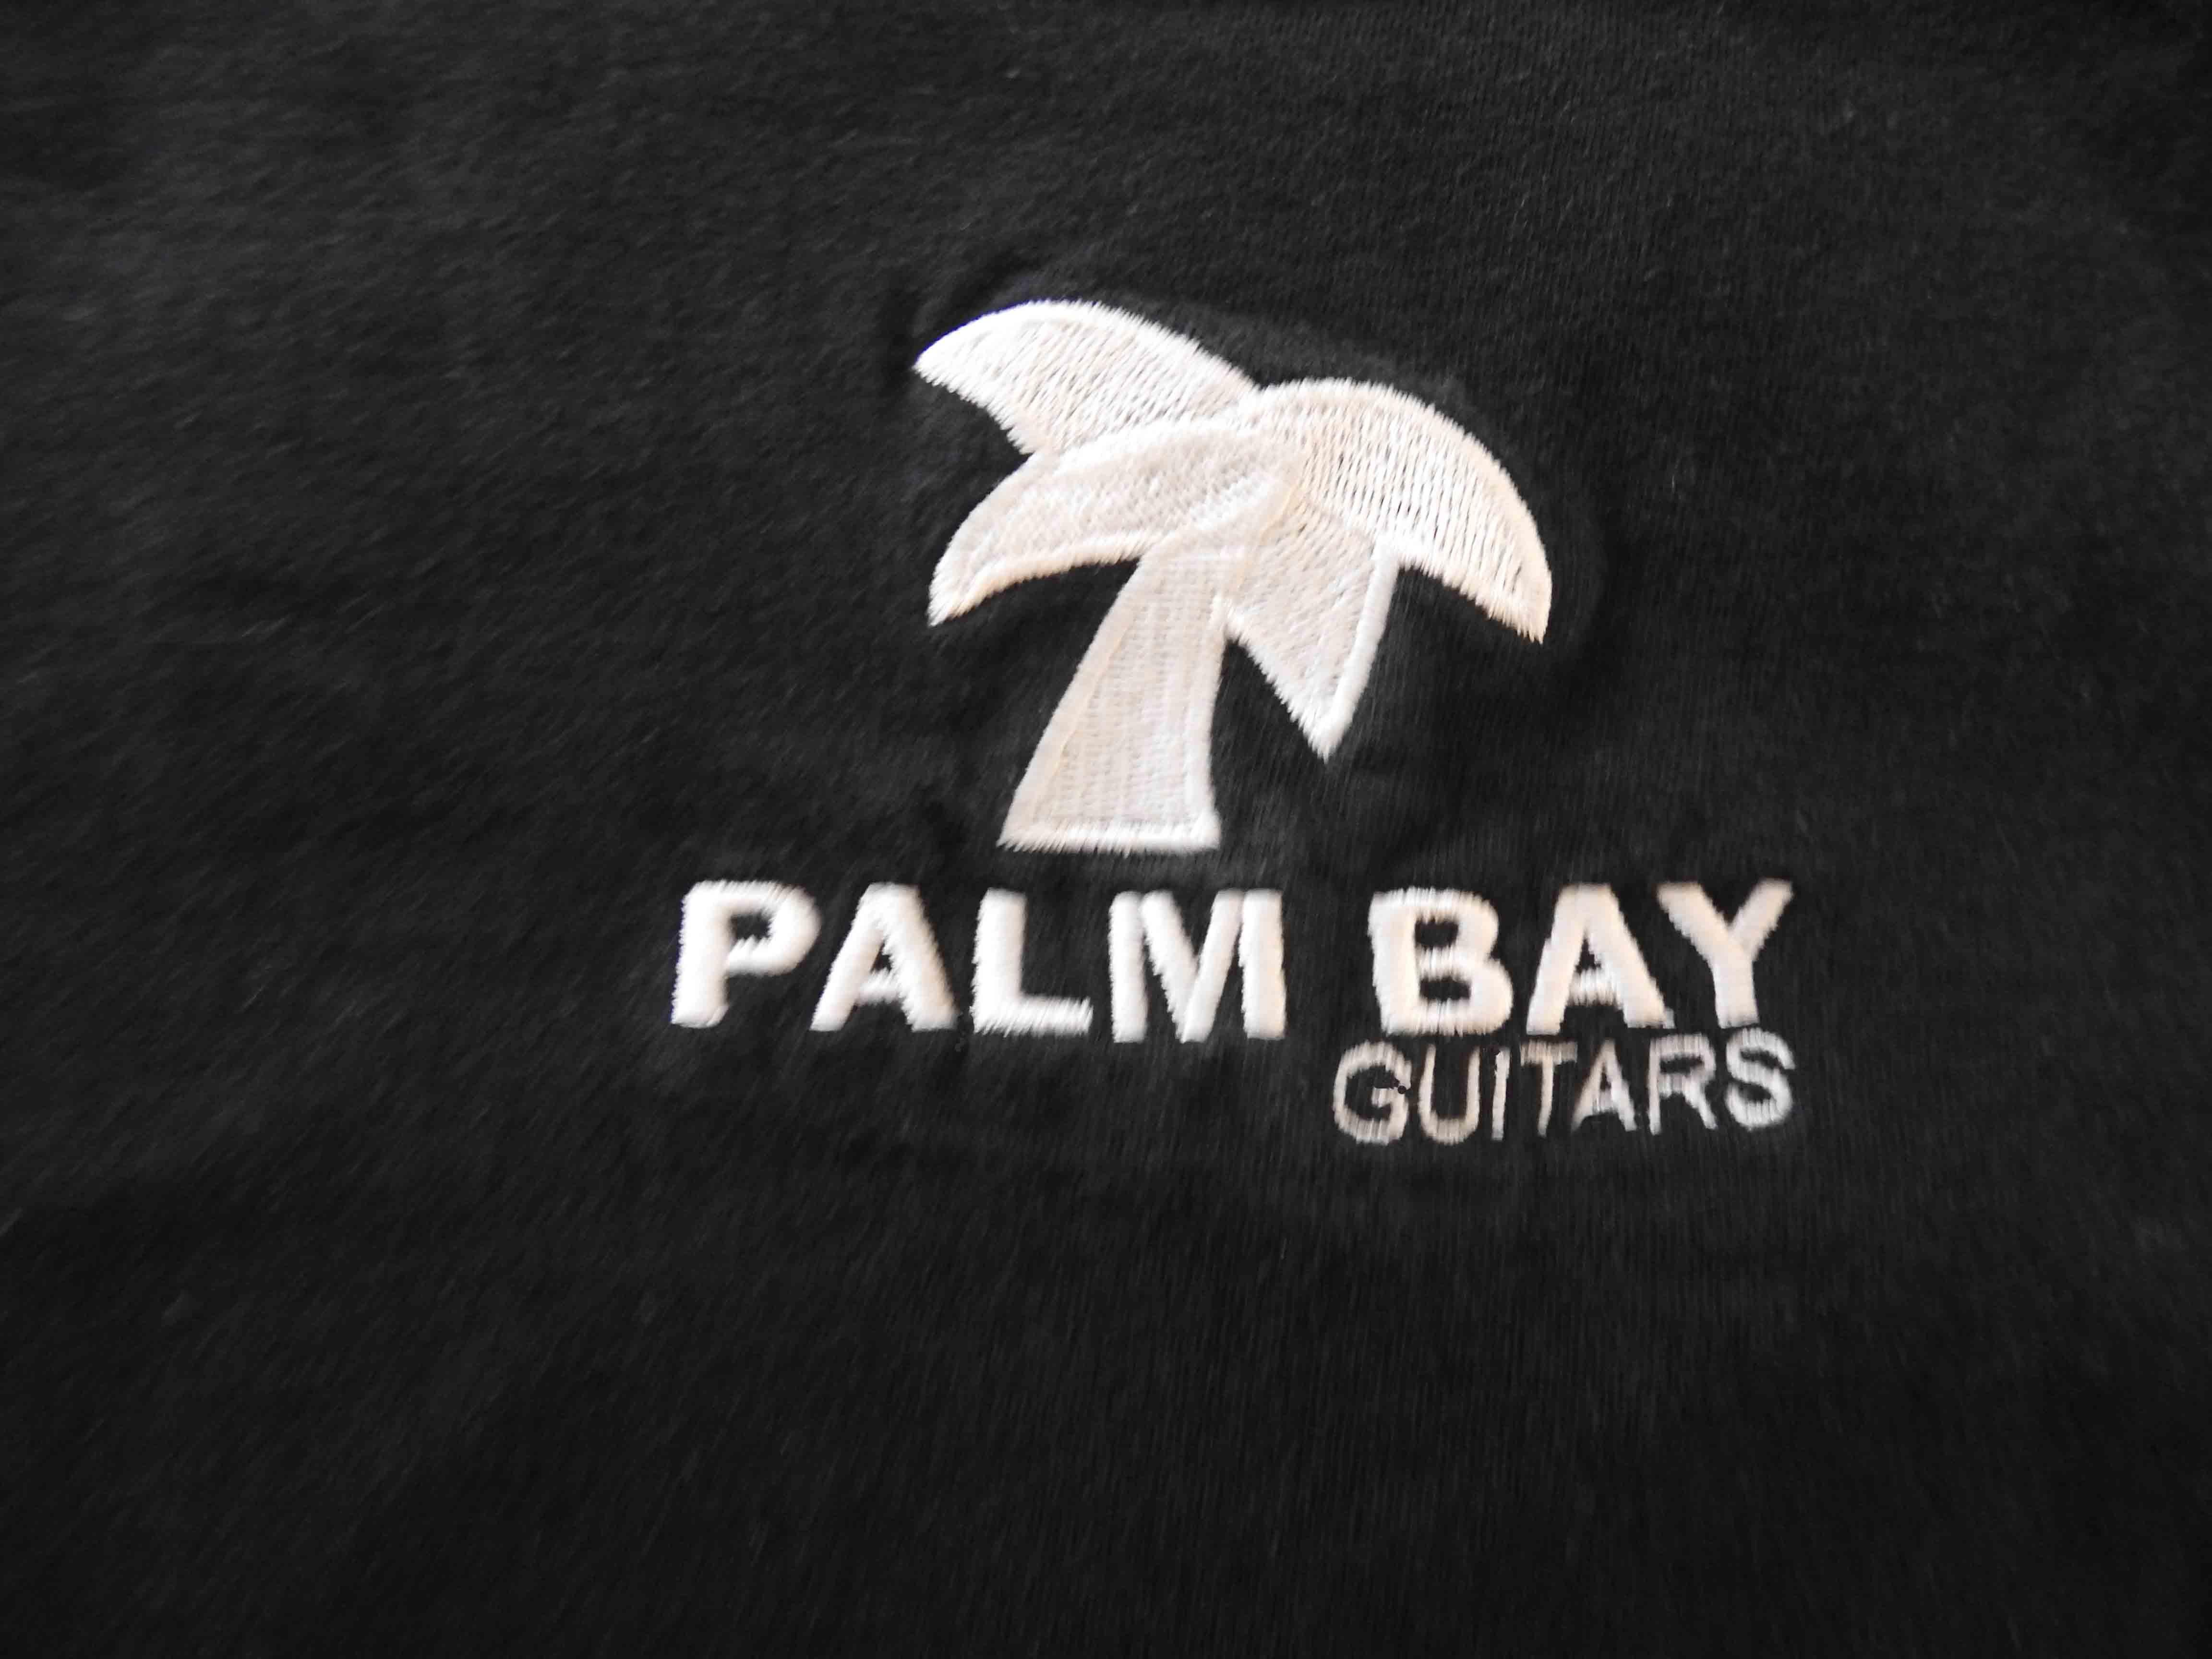 Palm Bay Guitars T Shirt Small